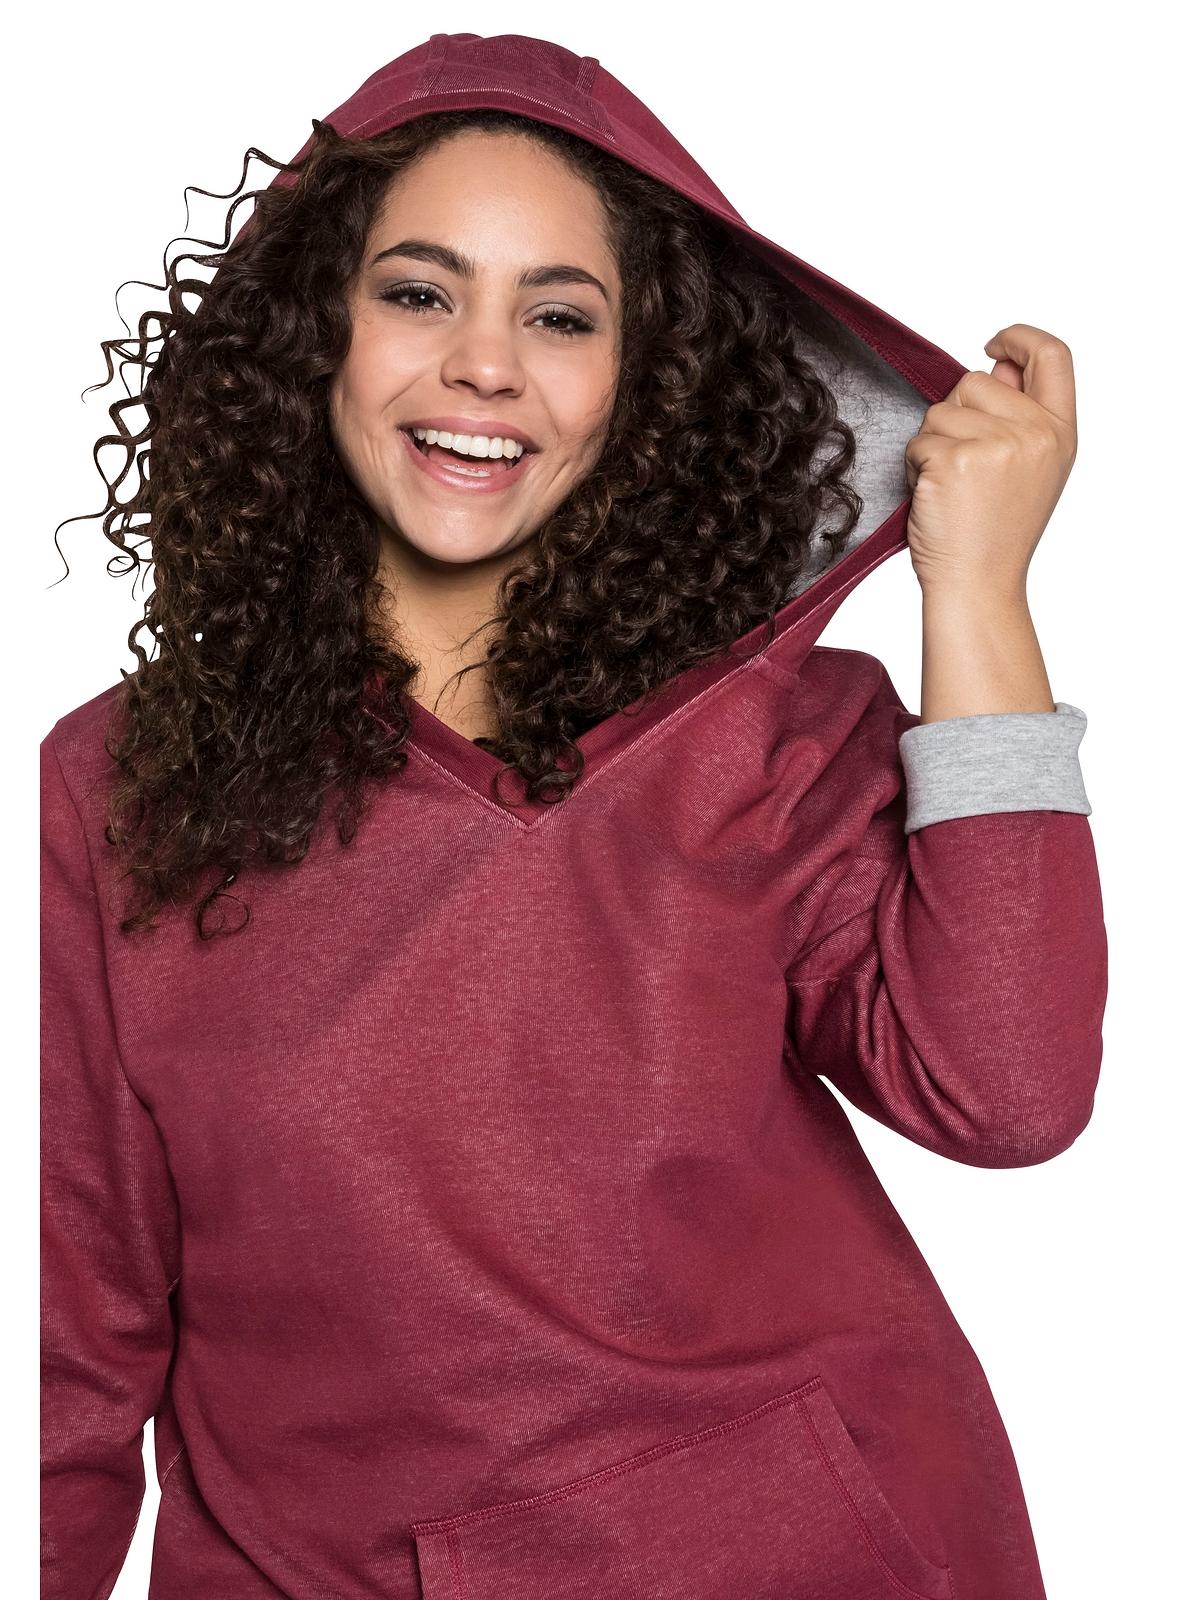 Sheego Sweatkleid in rubinrot günstig kaufen